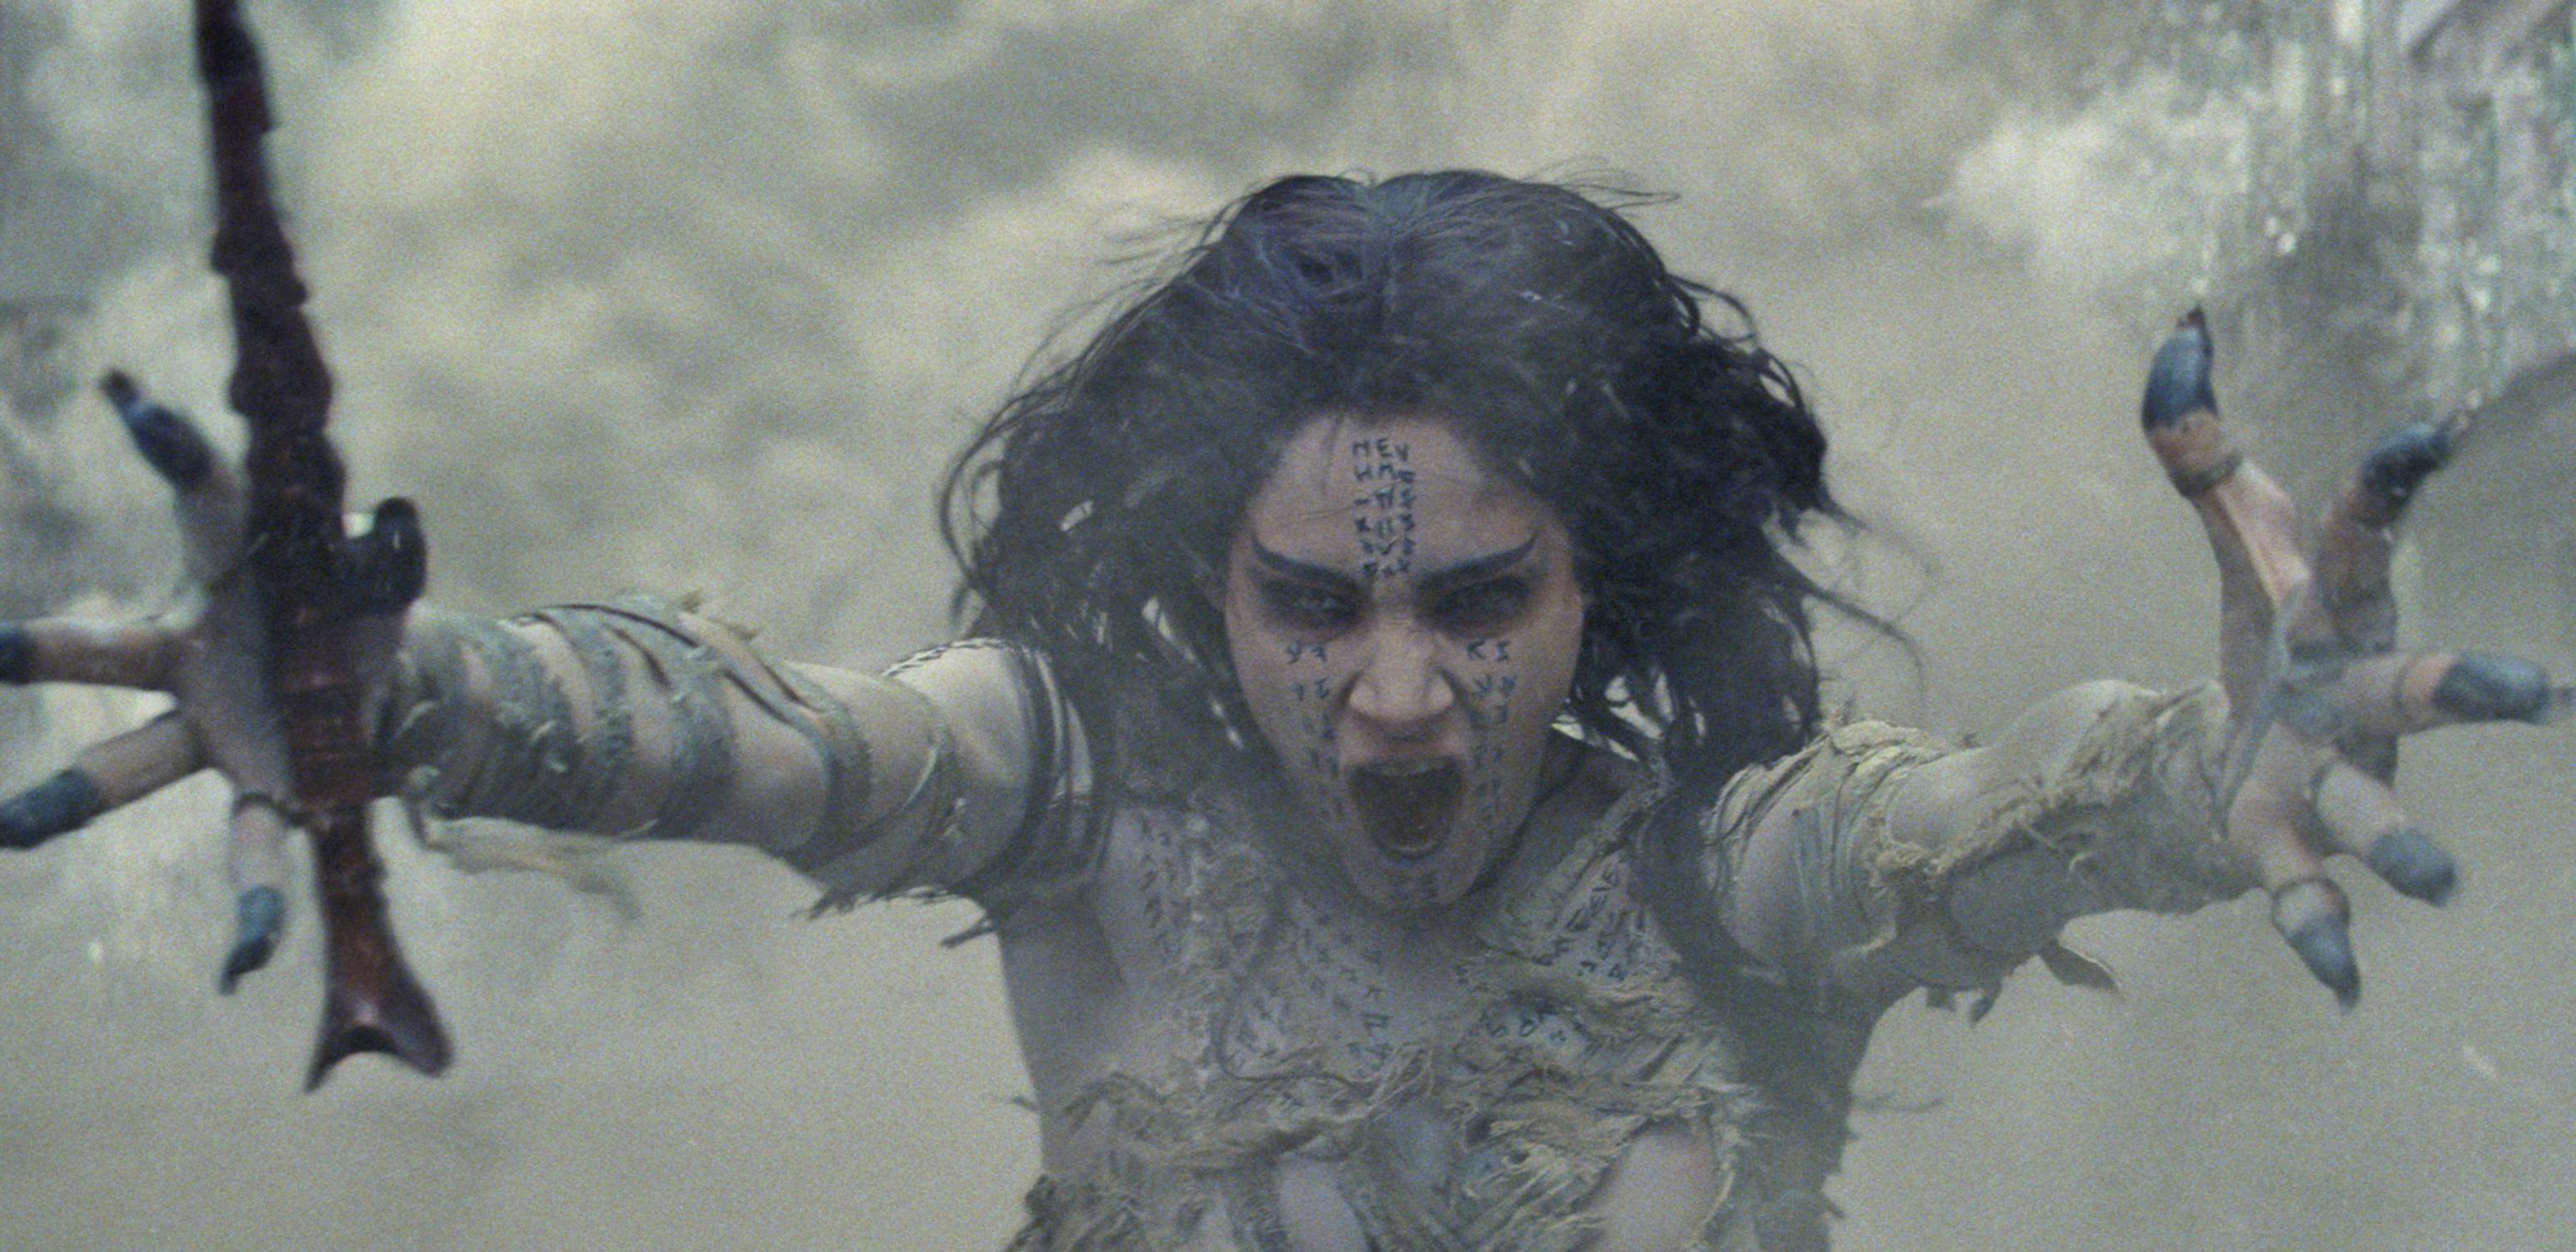 Filmkritik Die Mumie